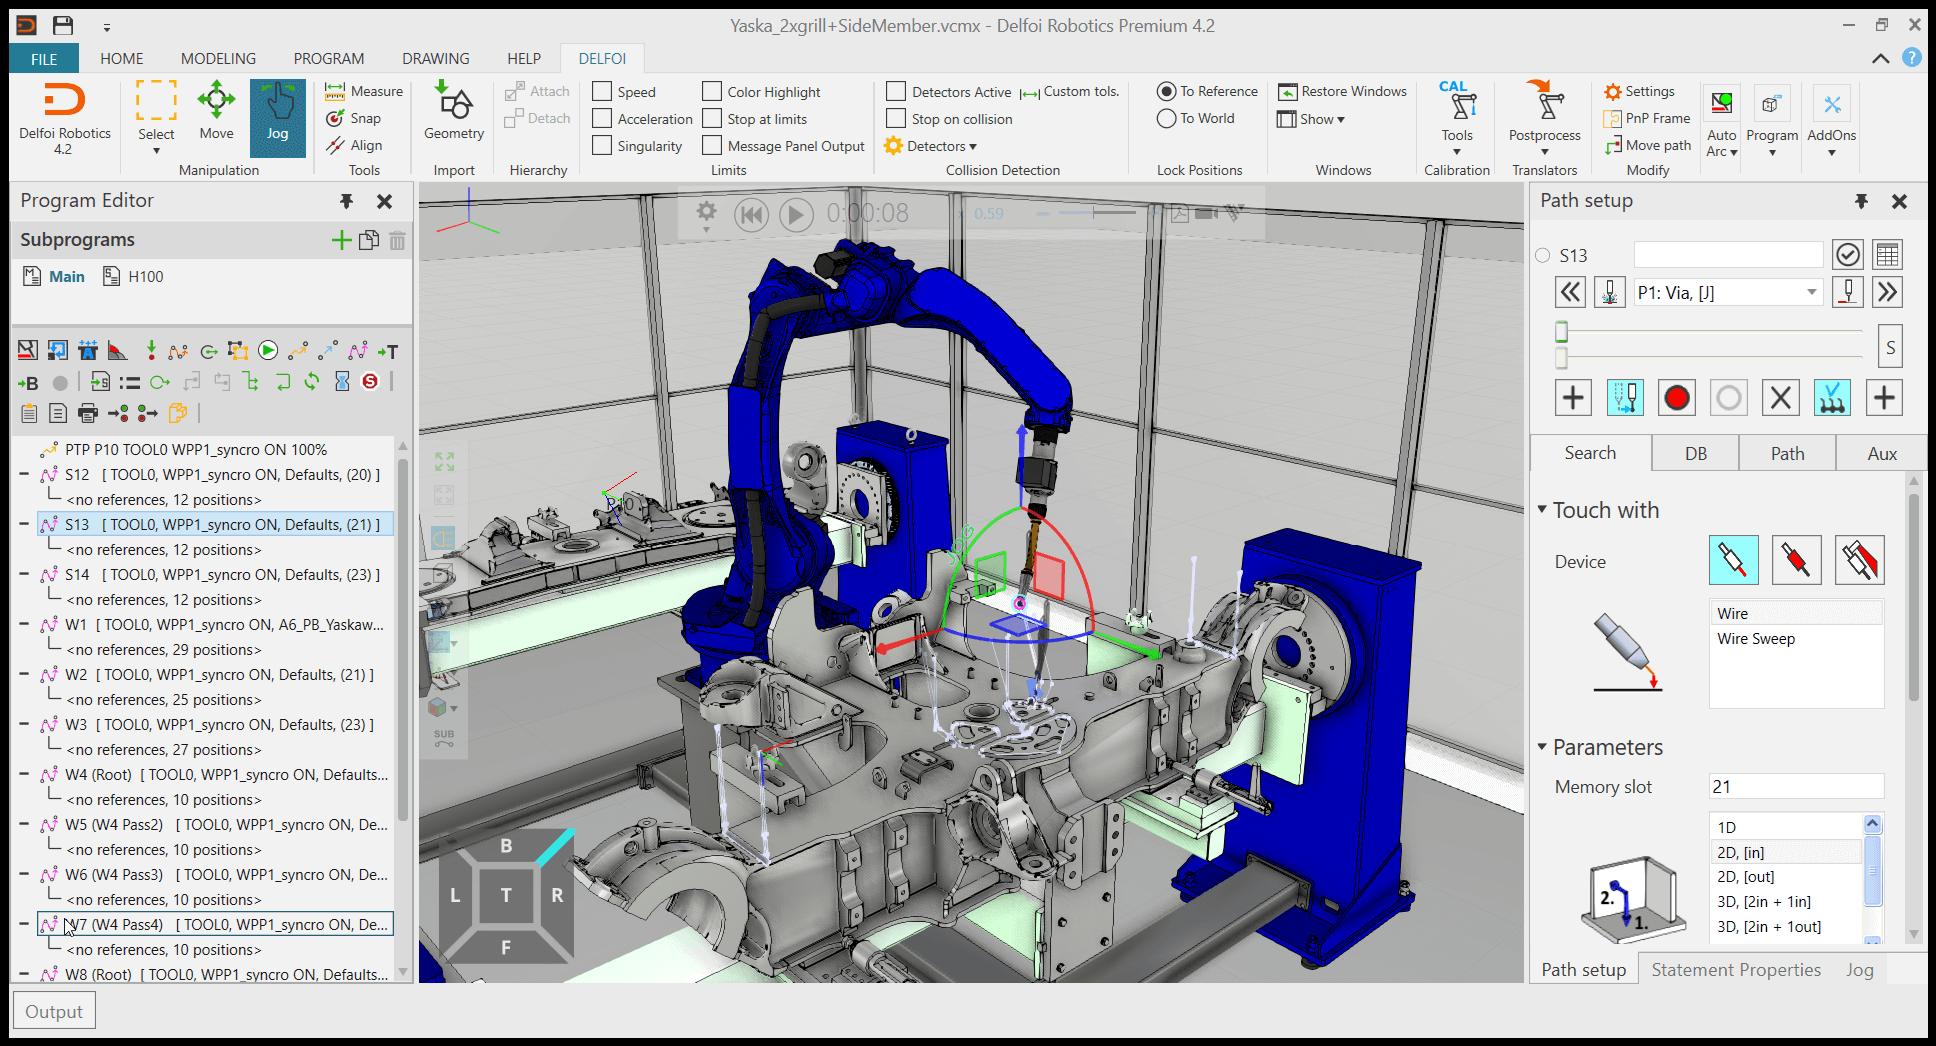 Delfoi Robotics Offline Programming Software OLP